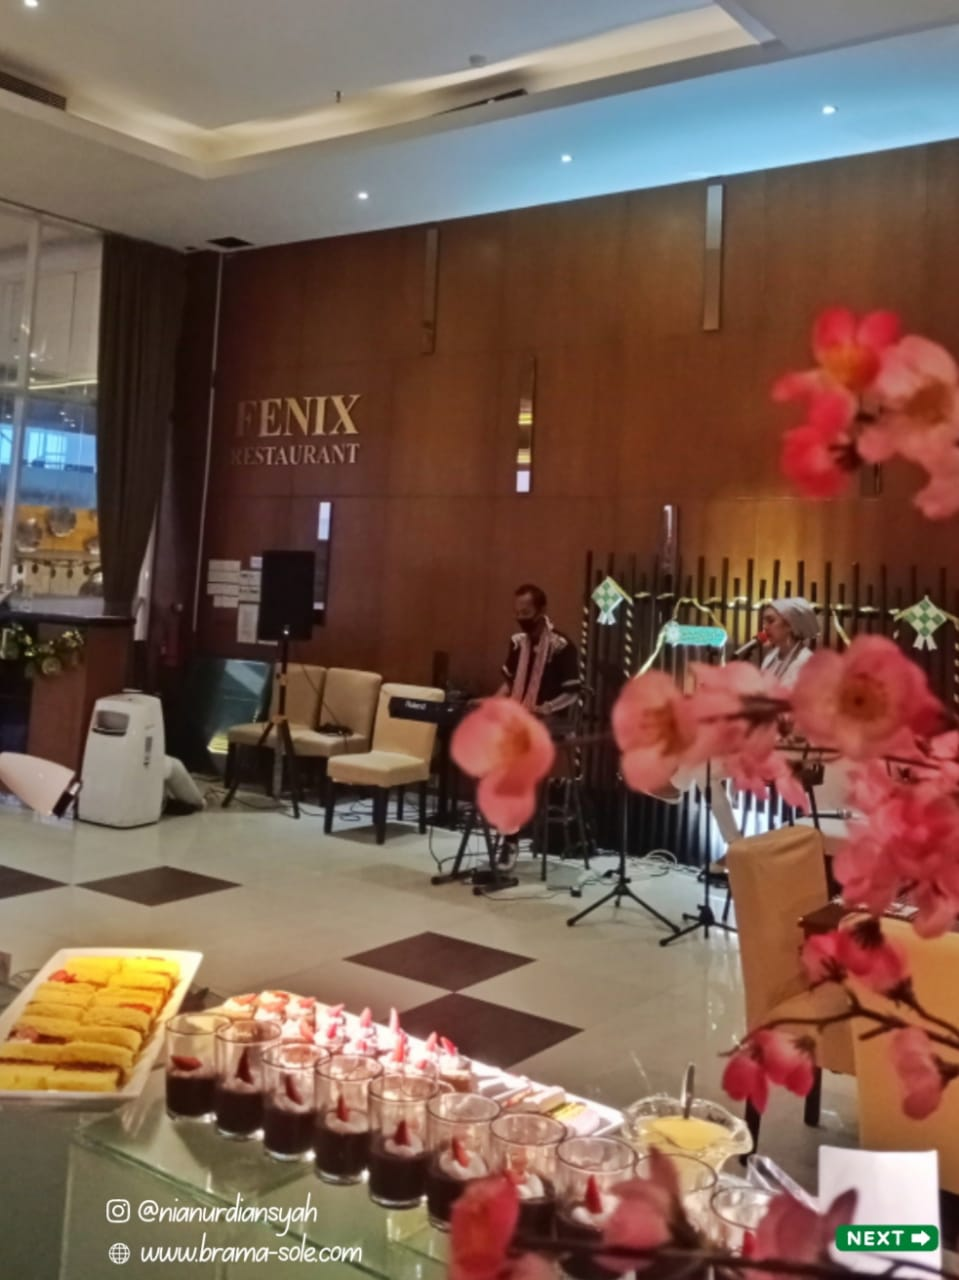 Fenix restaurant Hotel Gets Semarang